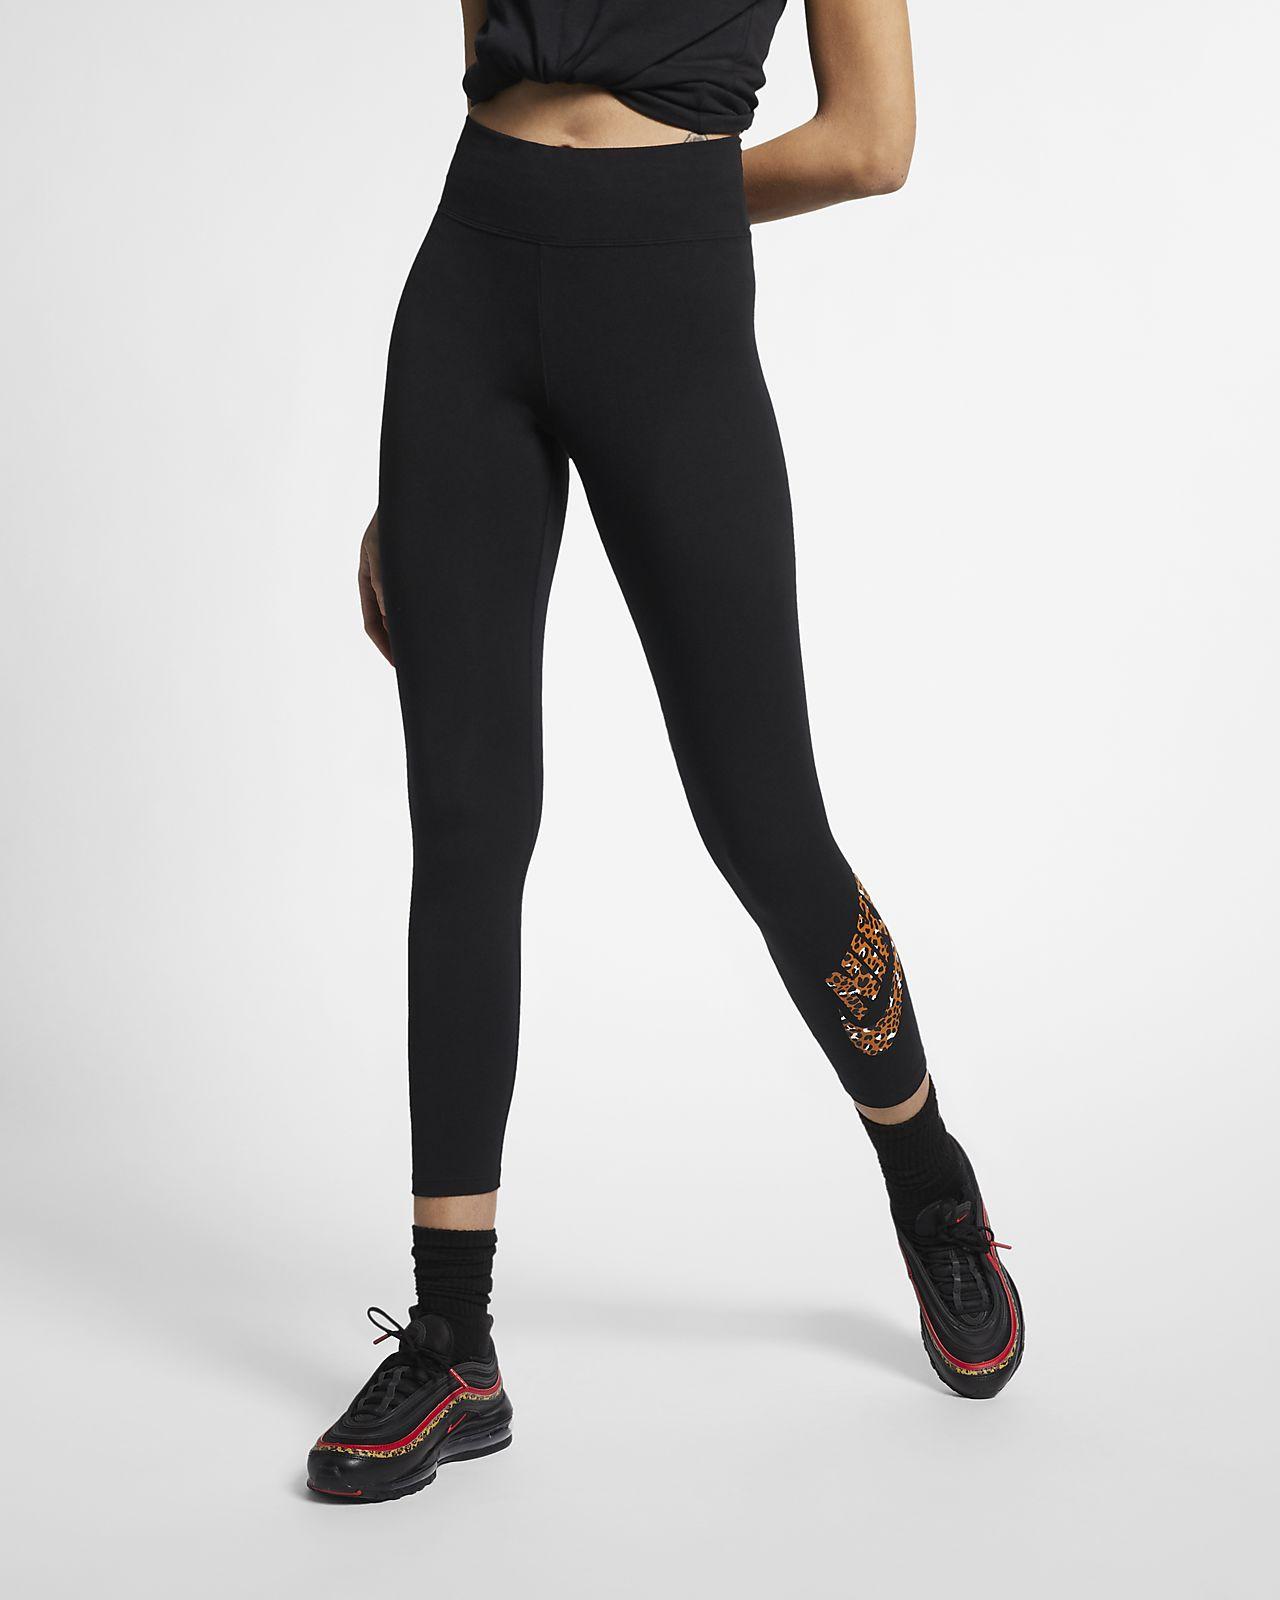 Dámské legíny Nike Sportswear Animal Print